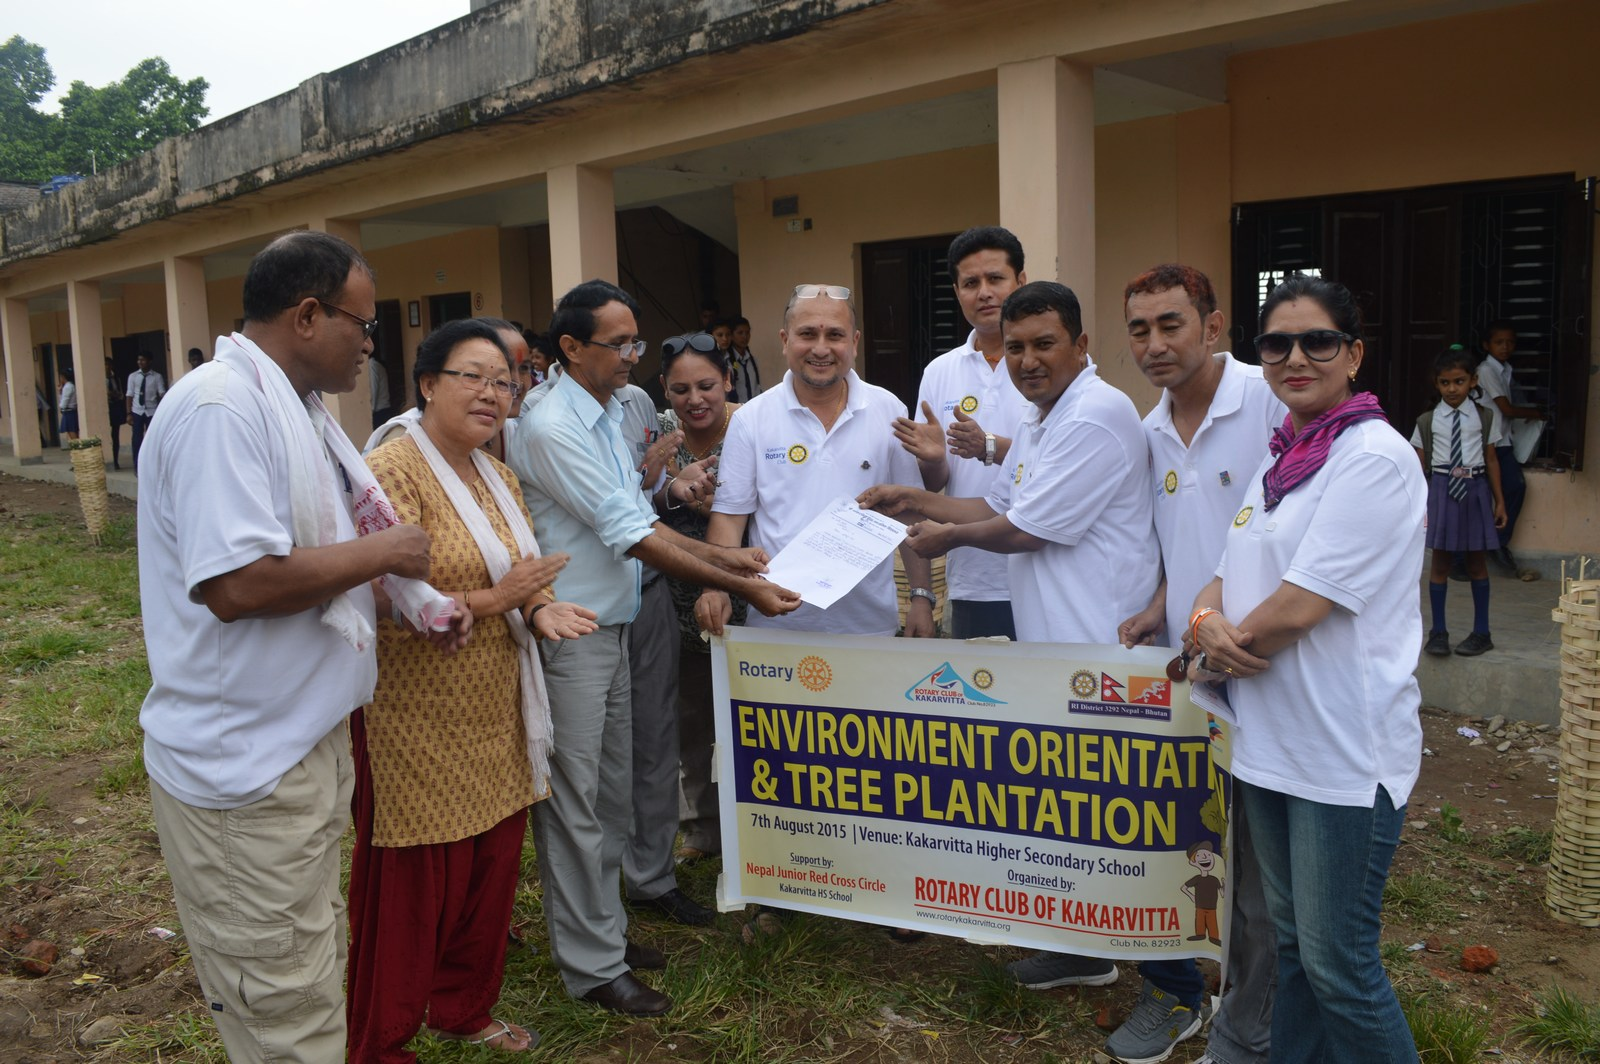 Enviroment Orientation Tree Plantation Rotary Club Of Kakarvitta 20